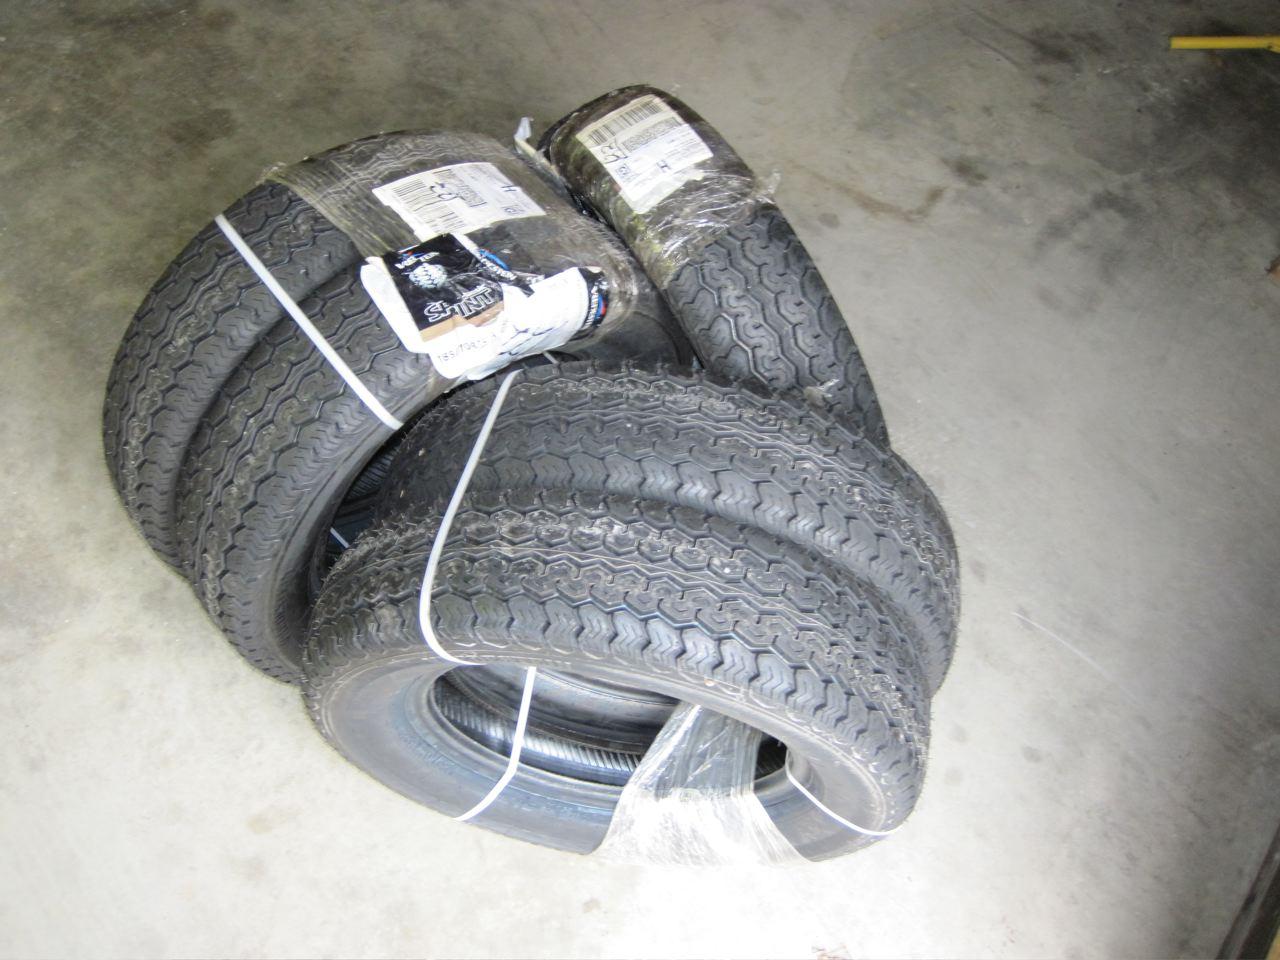 185 70 15 vredestein sprint classic tires 1. Black Bedroom Furniture Sets. Home Design Ideas